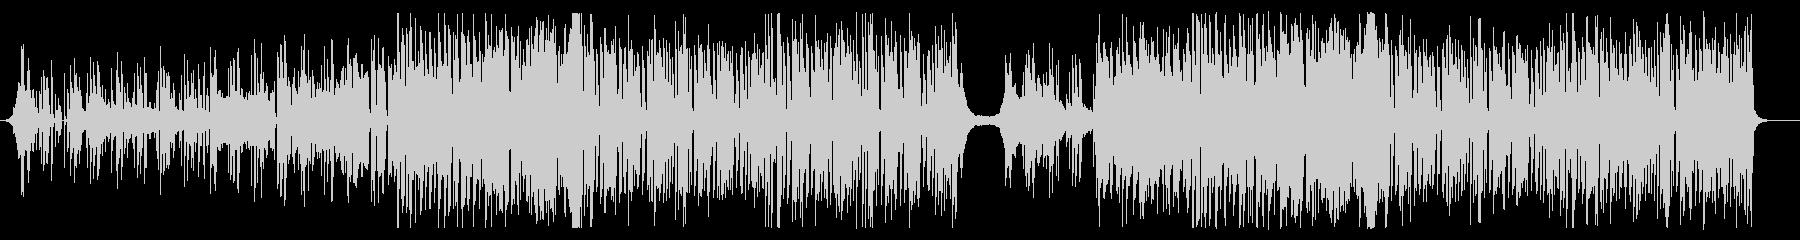 tropicalhouseの歌もの曲の未再生の波形